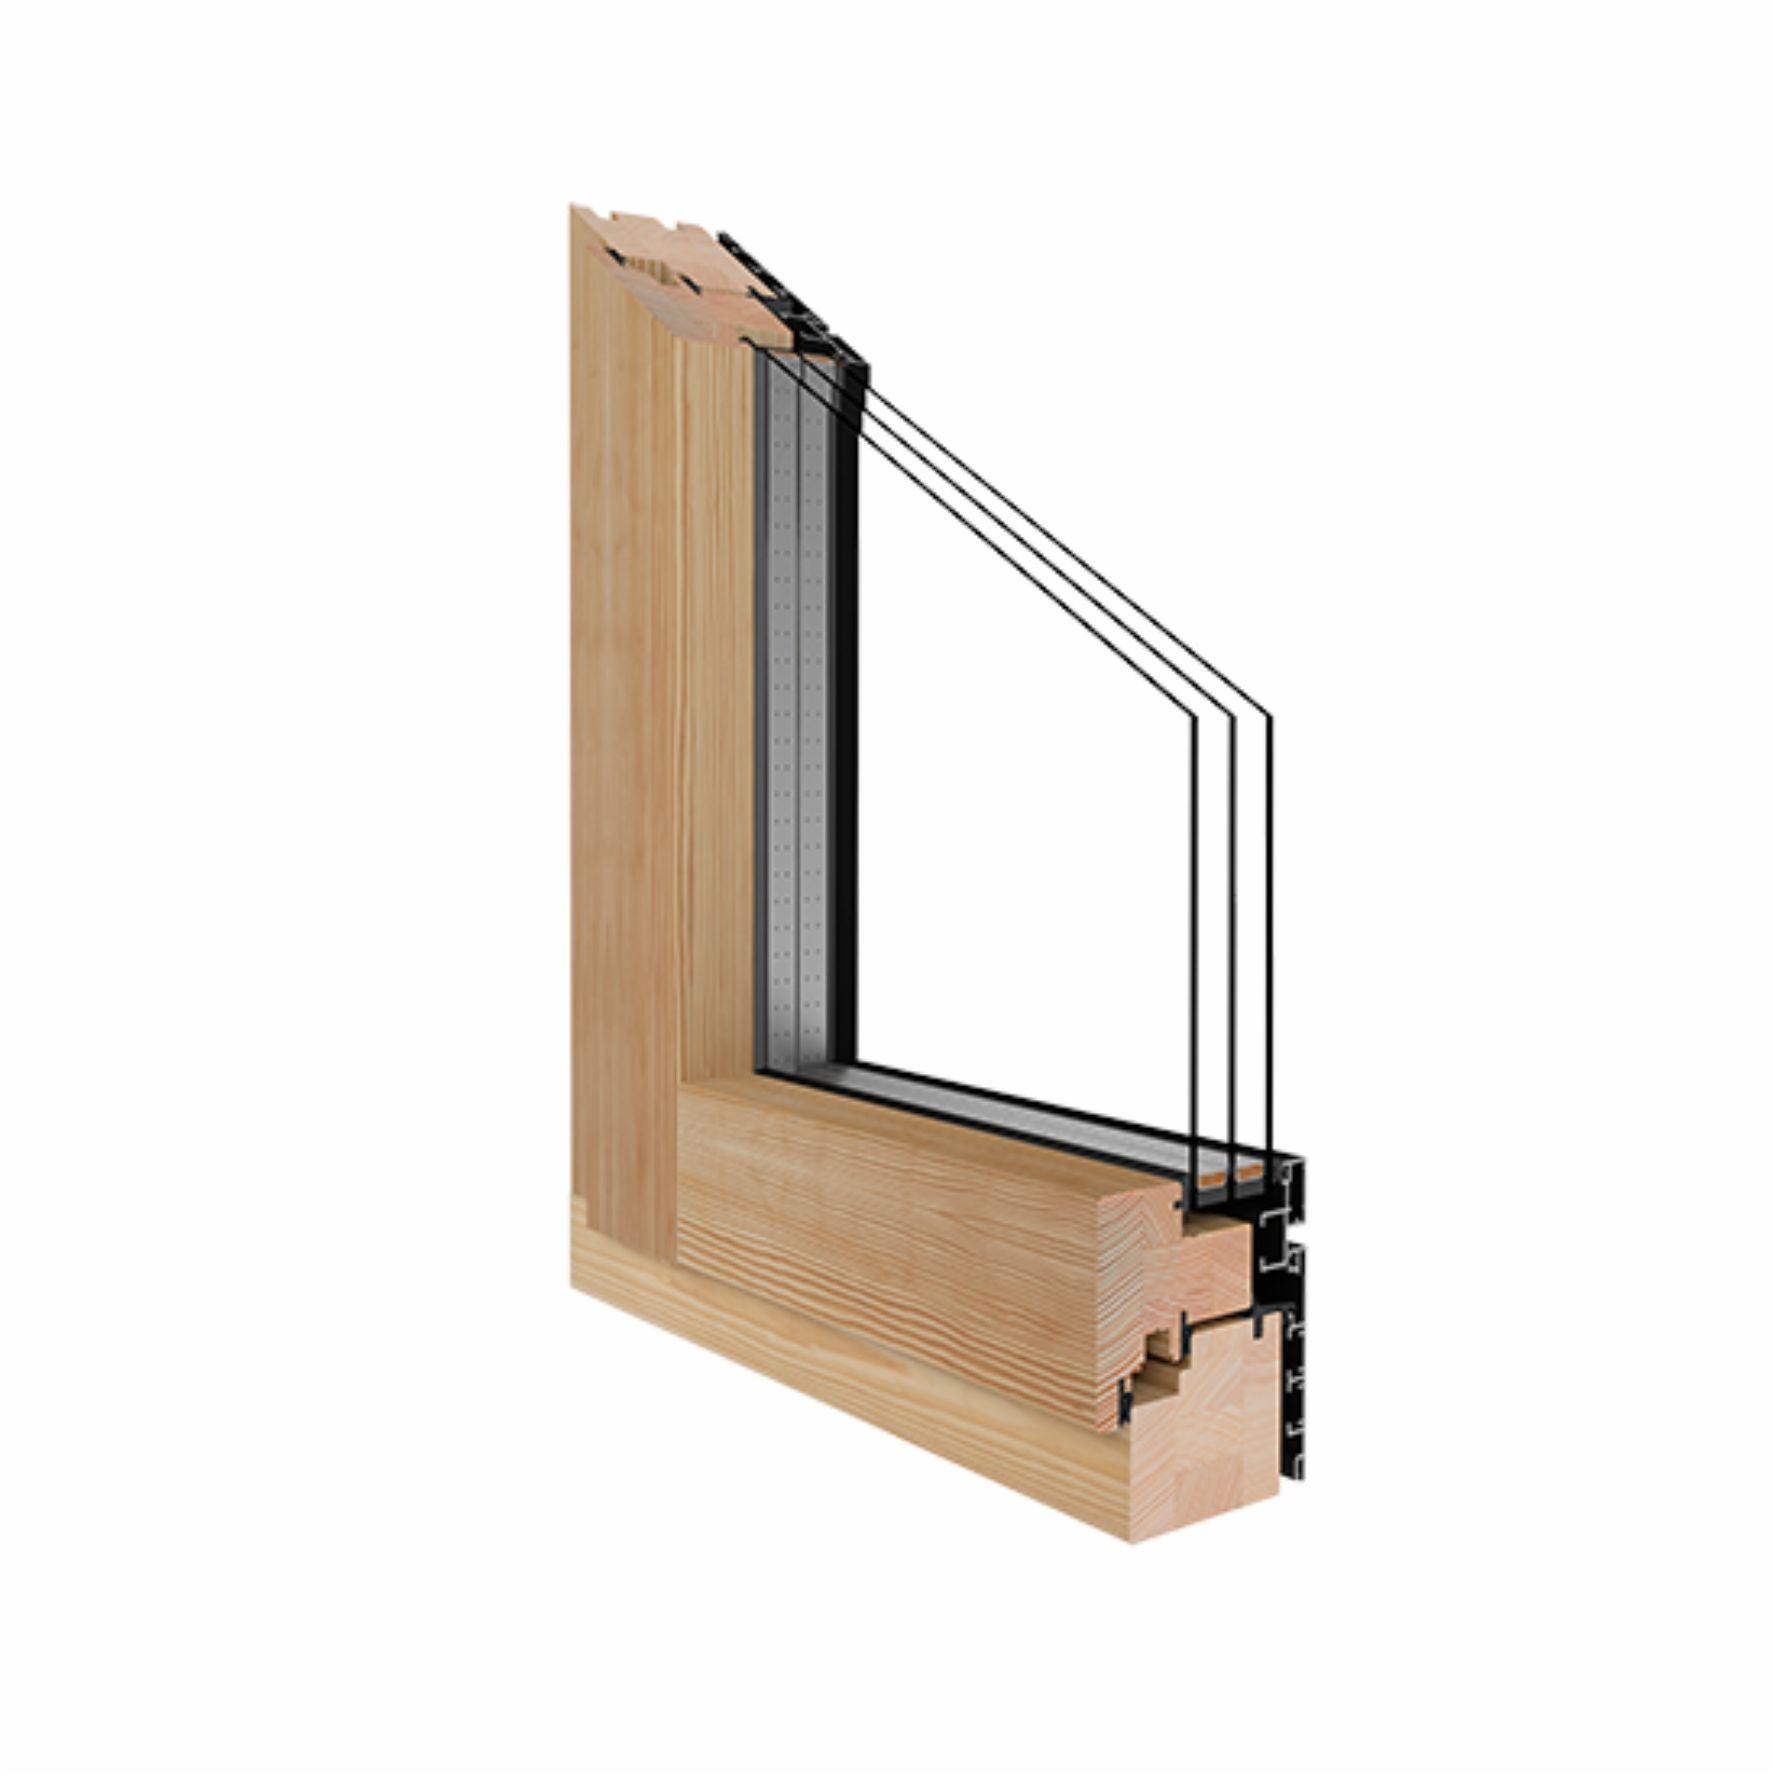 Full Size of Fenster Holz Alu Preisvergleich Kunststoff Vergleich Preise Kosten Pro Qm Josko Druteduoline 78 Kiefer Alle Gren Rostock Standardmaße Velux Rollo Braun Fenster Fenster Holz Alu